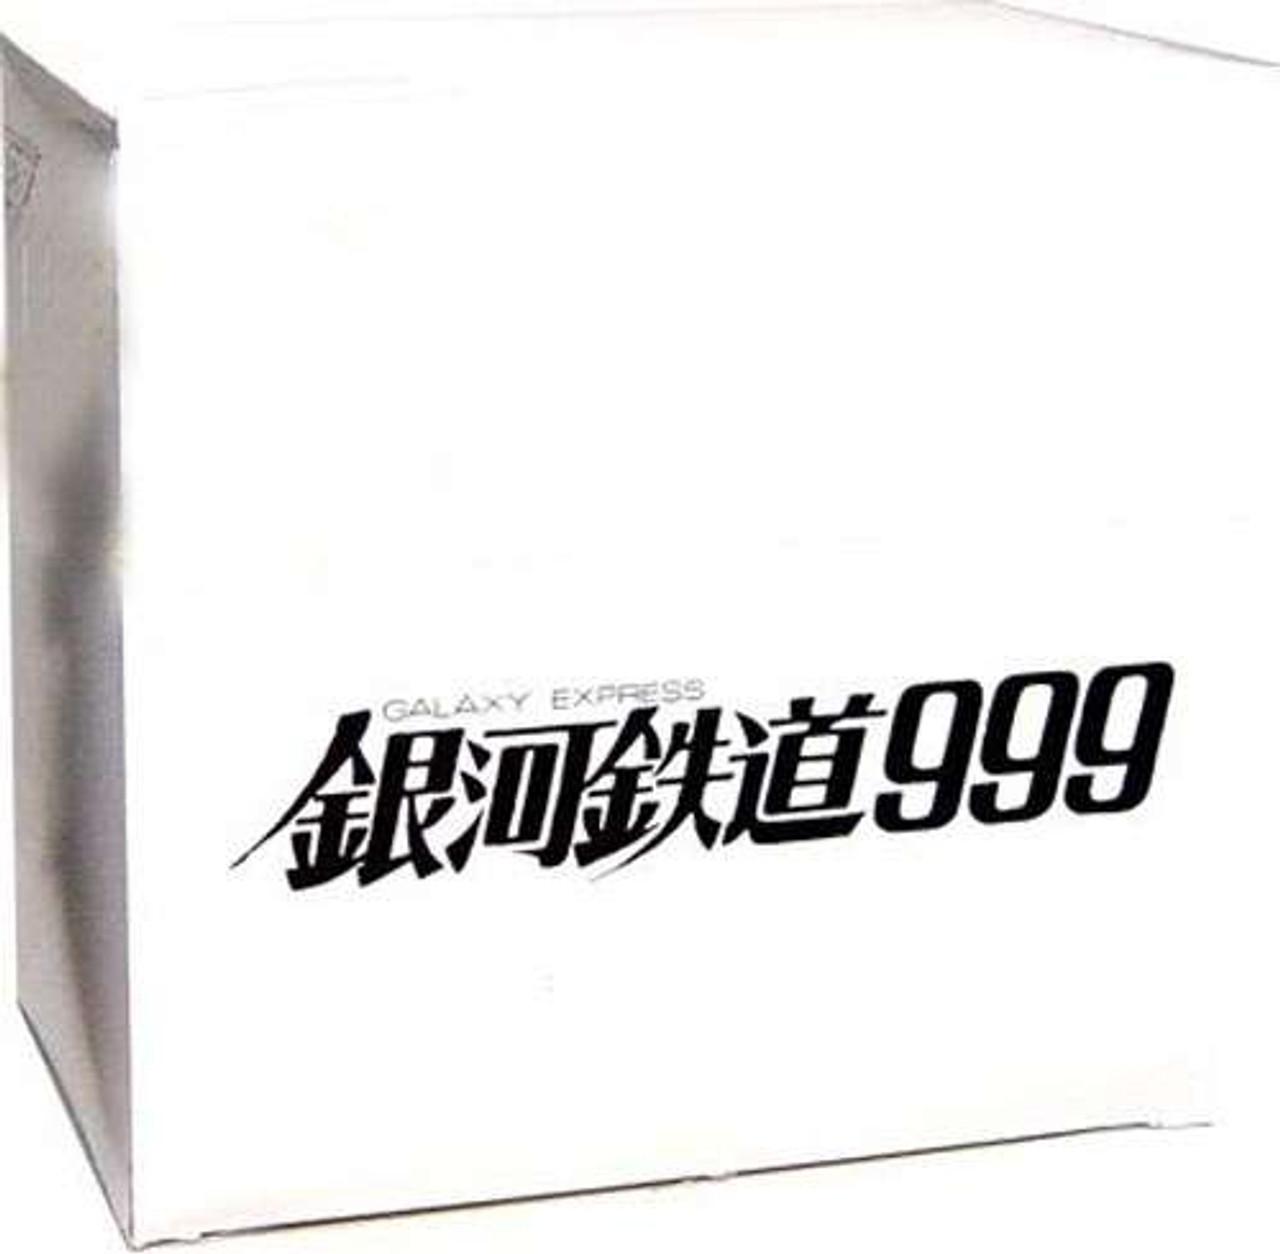 Galaxy Express 999 Box of 6 Random Dioramas